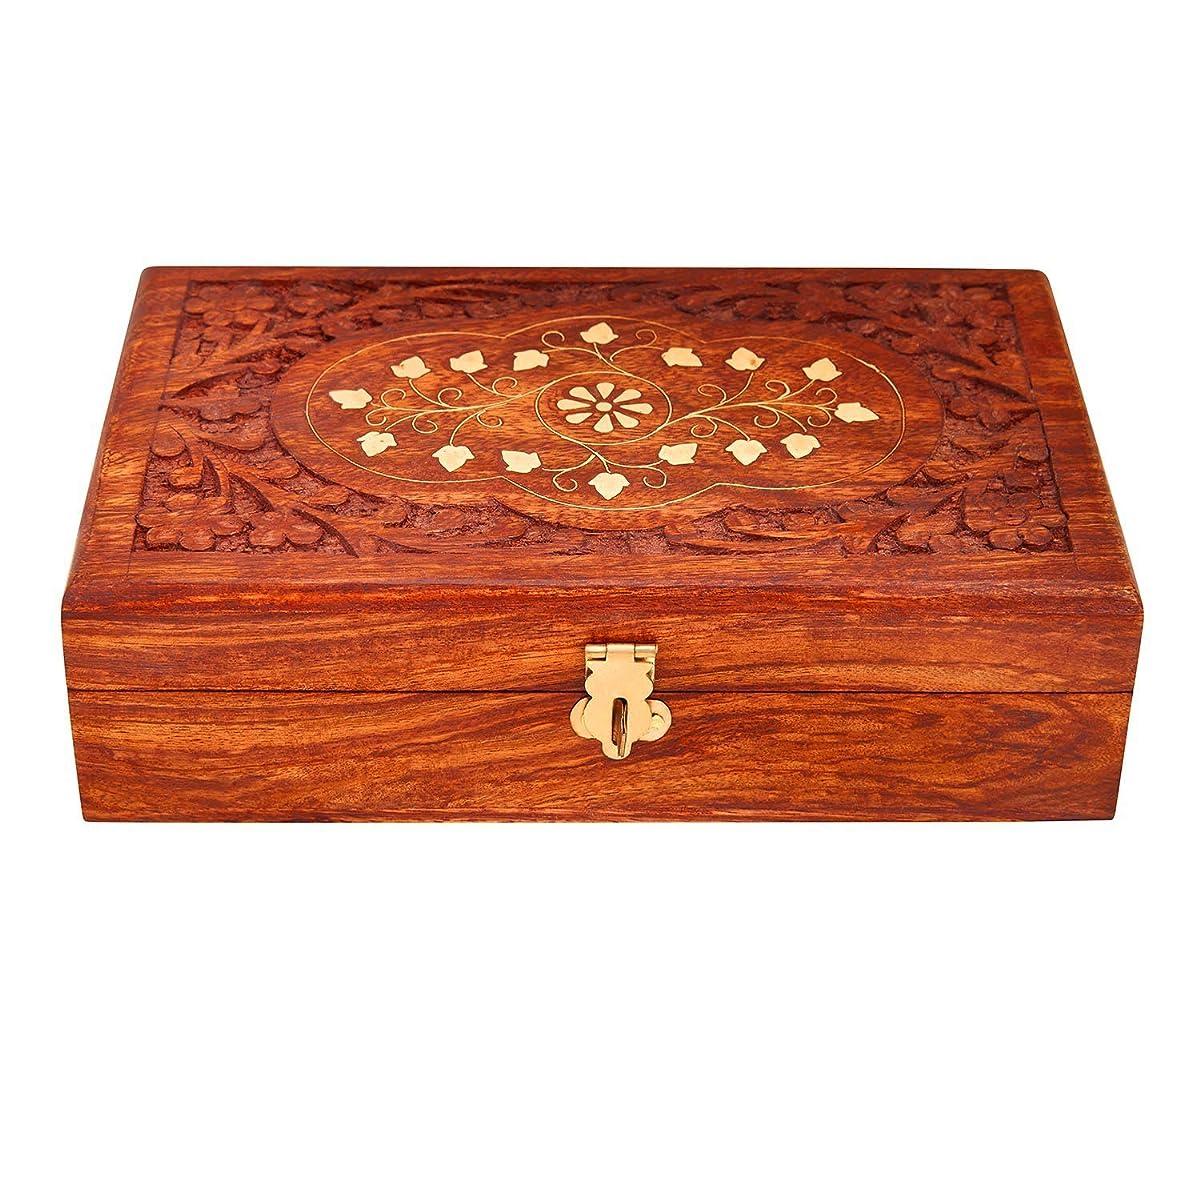 Great Birthday Gift Ideas Handmade Decorative Wooden Jewelry Box With Free Lock & Key Jewelry Organizer Keepsake Box Treasure Chest Trinket Holder Lock Box Watch Box 8 x 5 Inch Anniversary Gifts Her